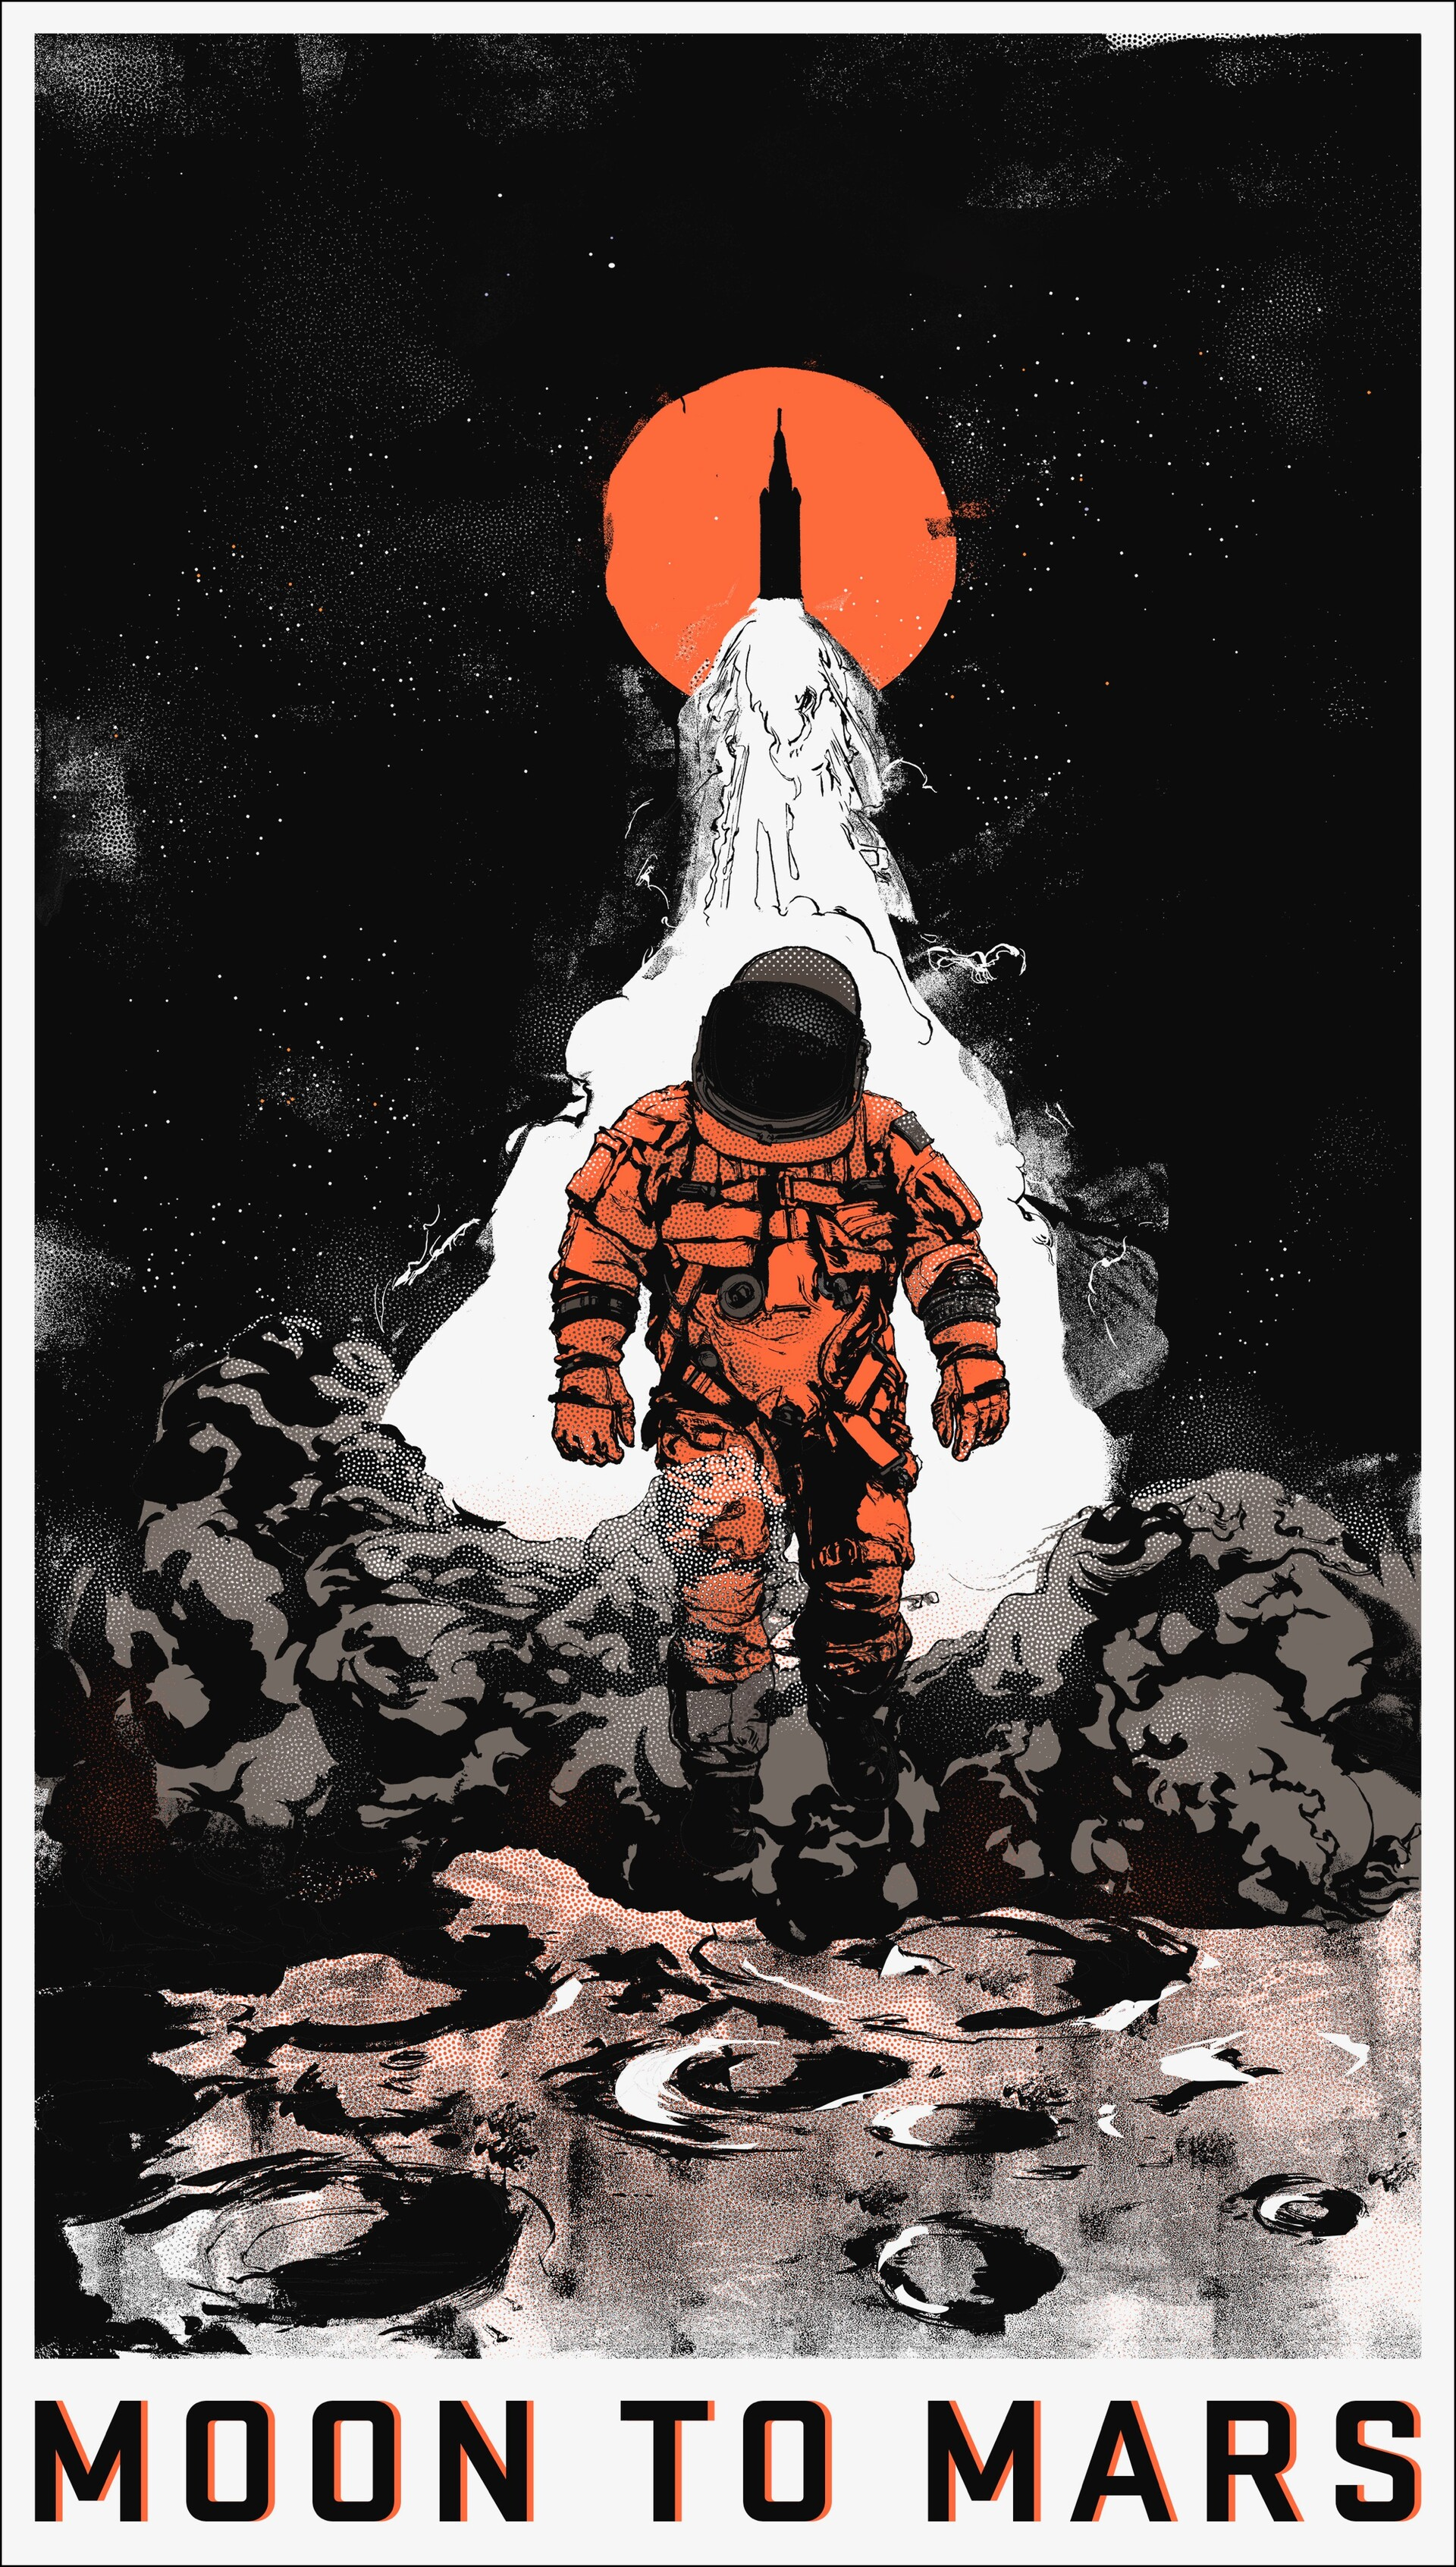 Moon to Mars: Full Poster